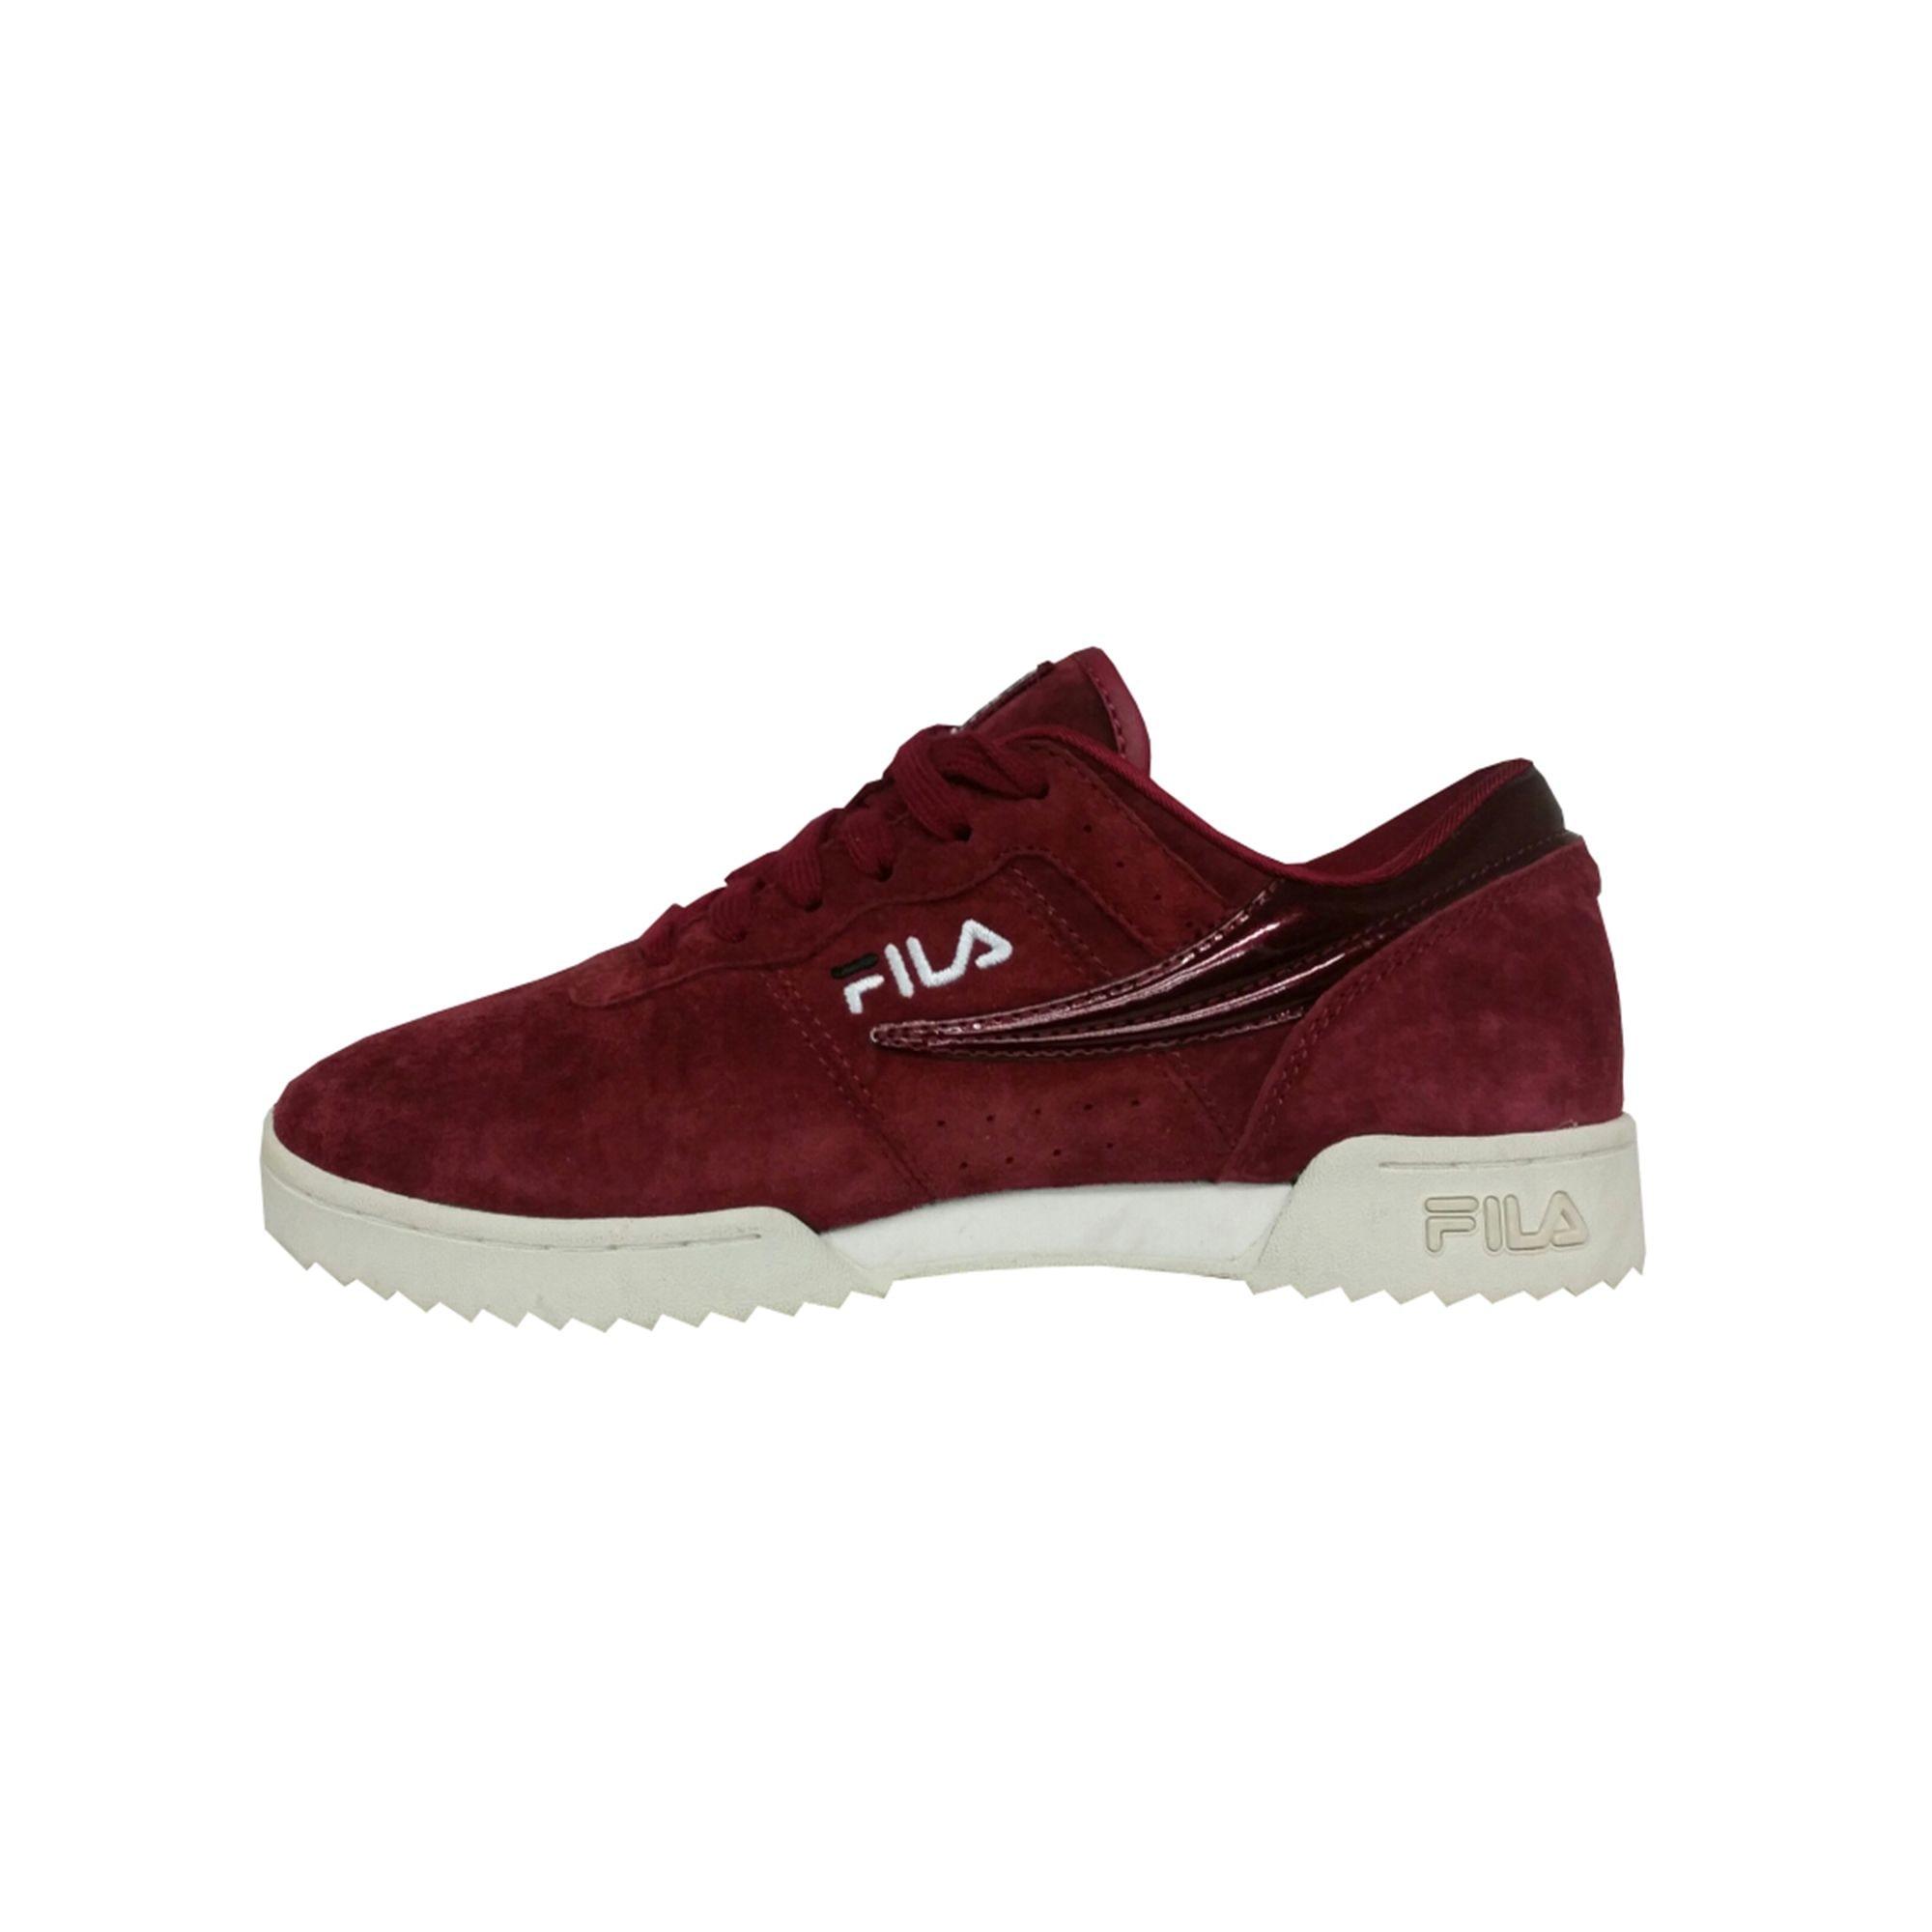 De 36 8651665 Sport Fila Rouge Chaussures rBxeoCd